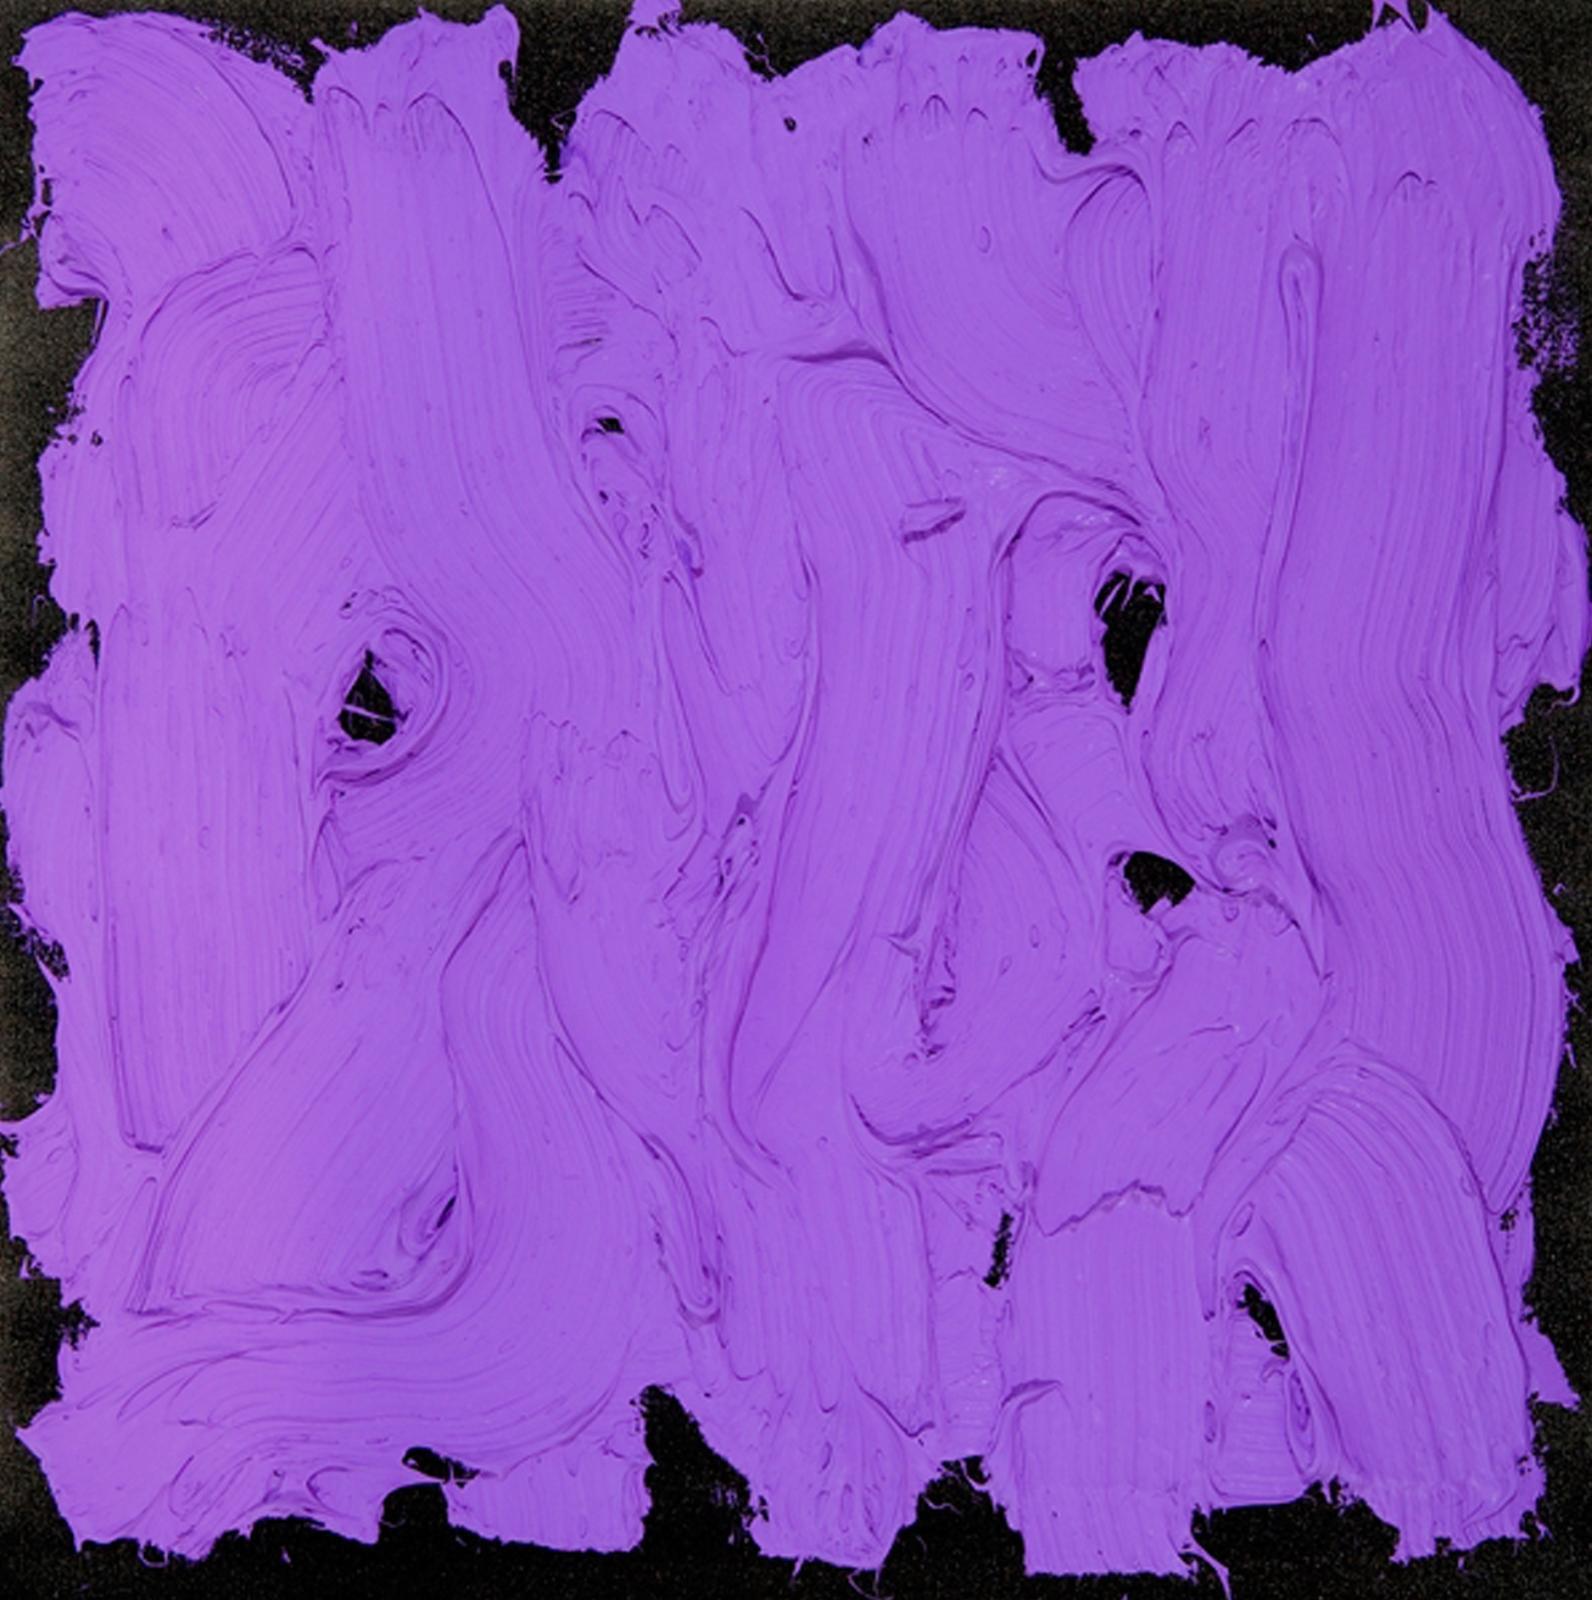 John Zinsser, Hysterical Phantasy, 2010